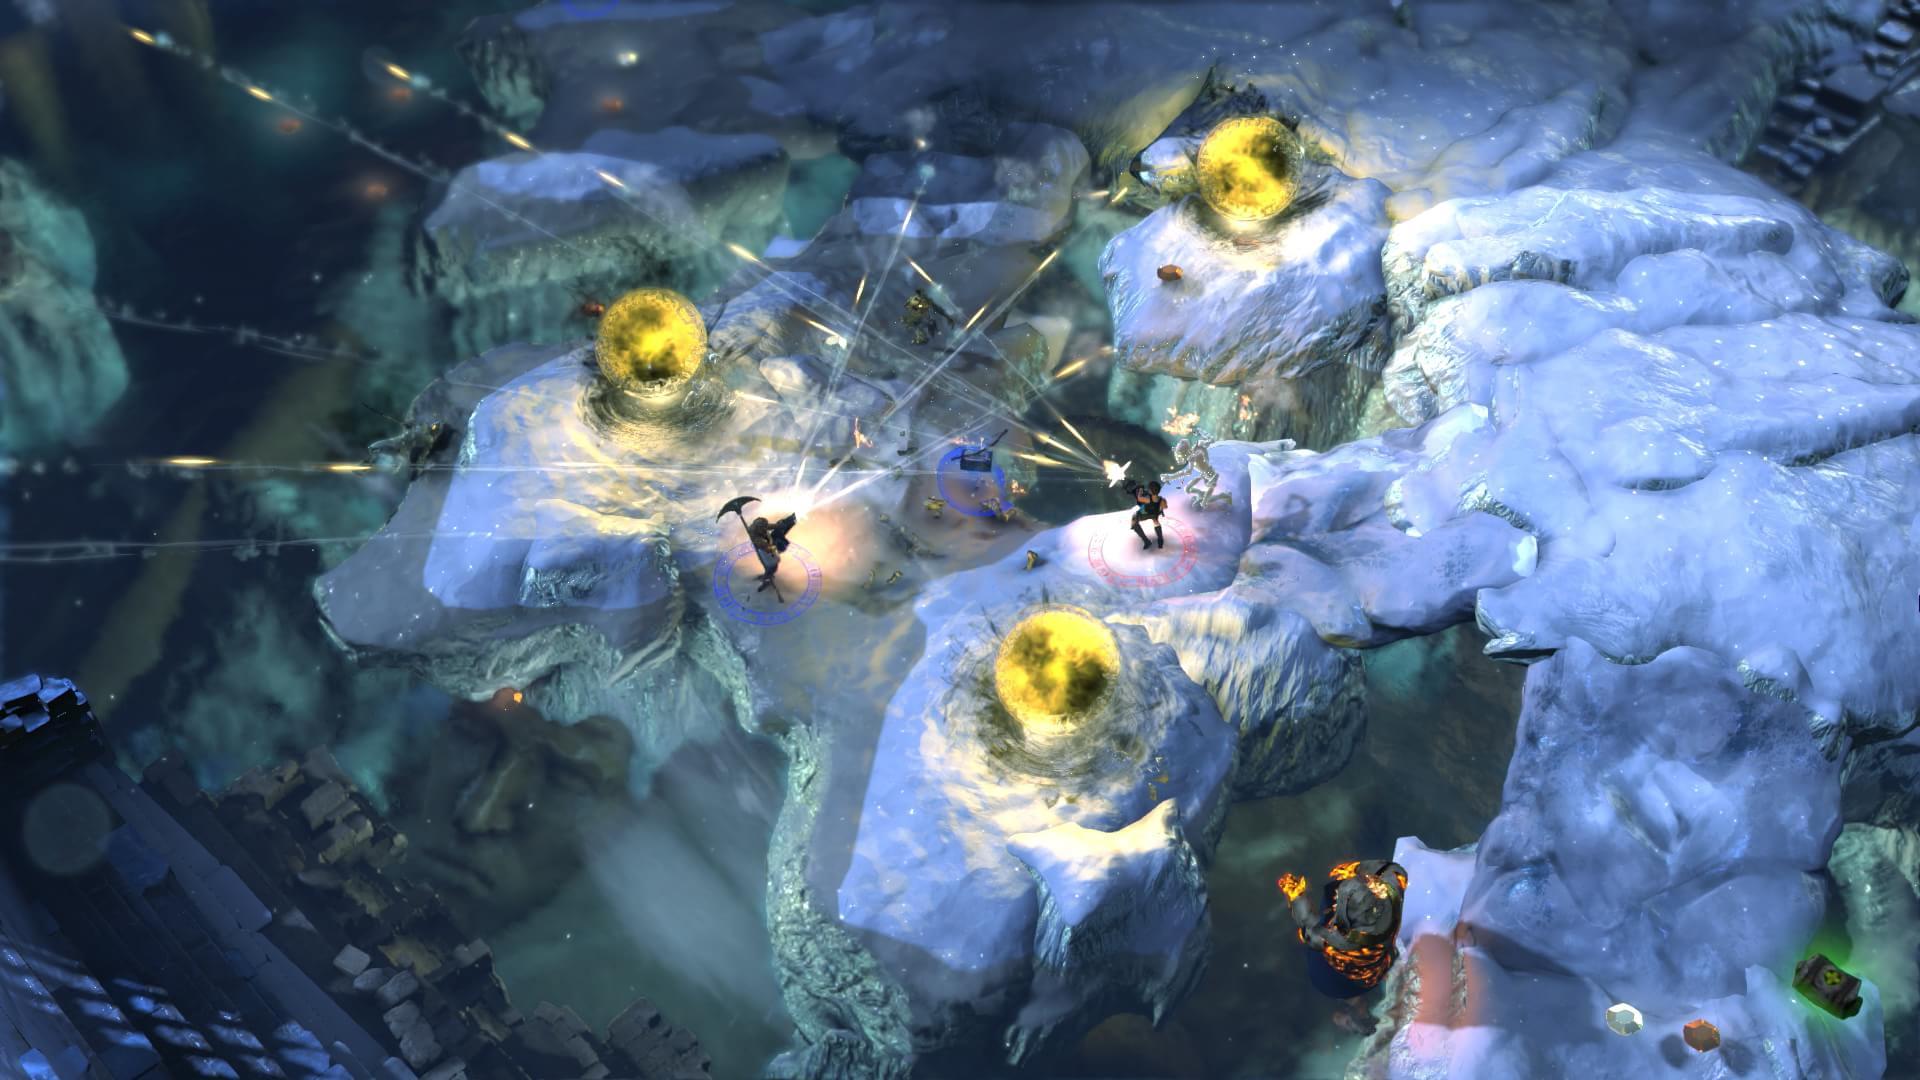 Novo DLC de Temple of Osiris traz tumba, desafios e skin para Lara Croft